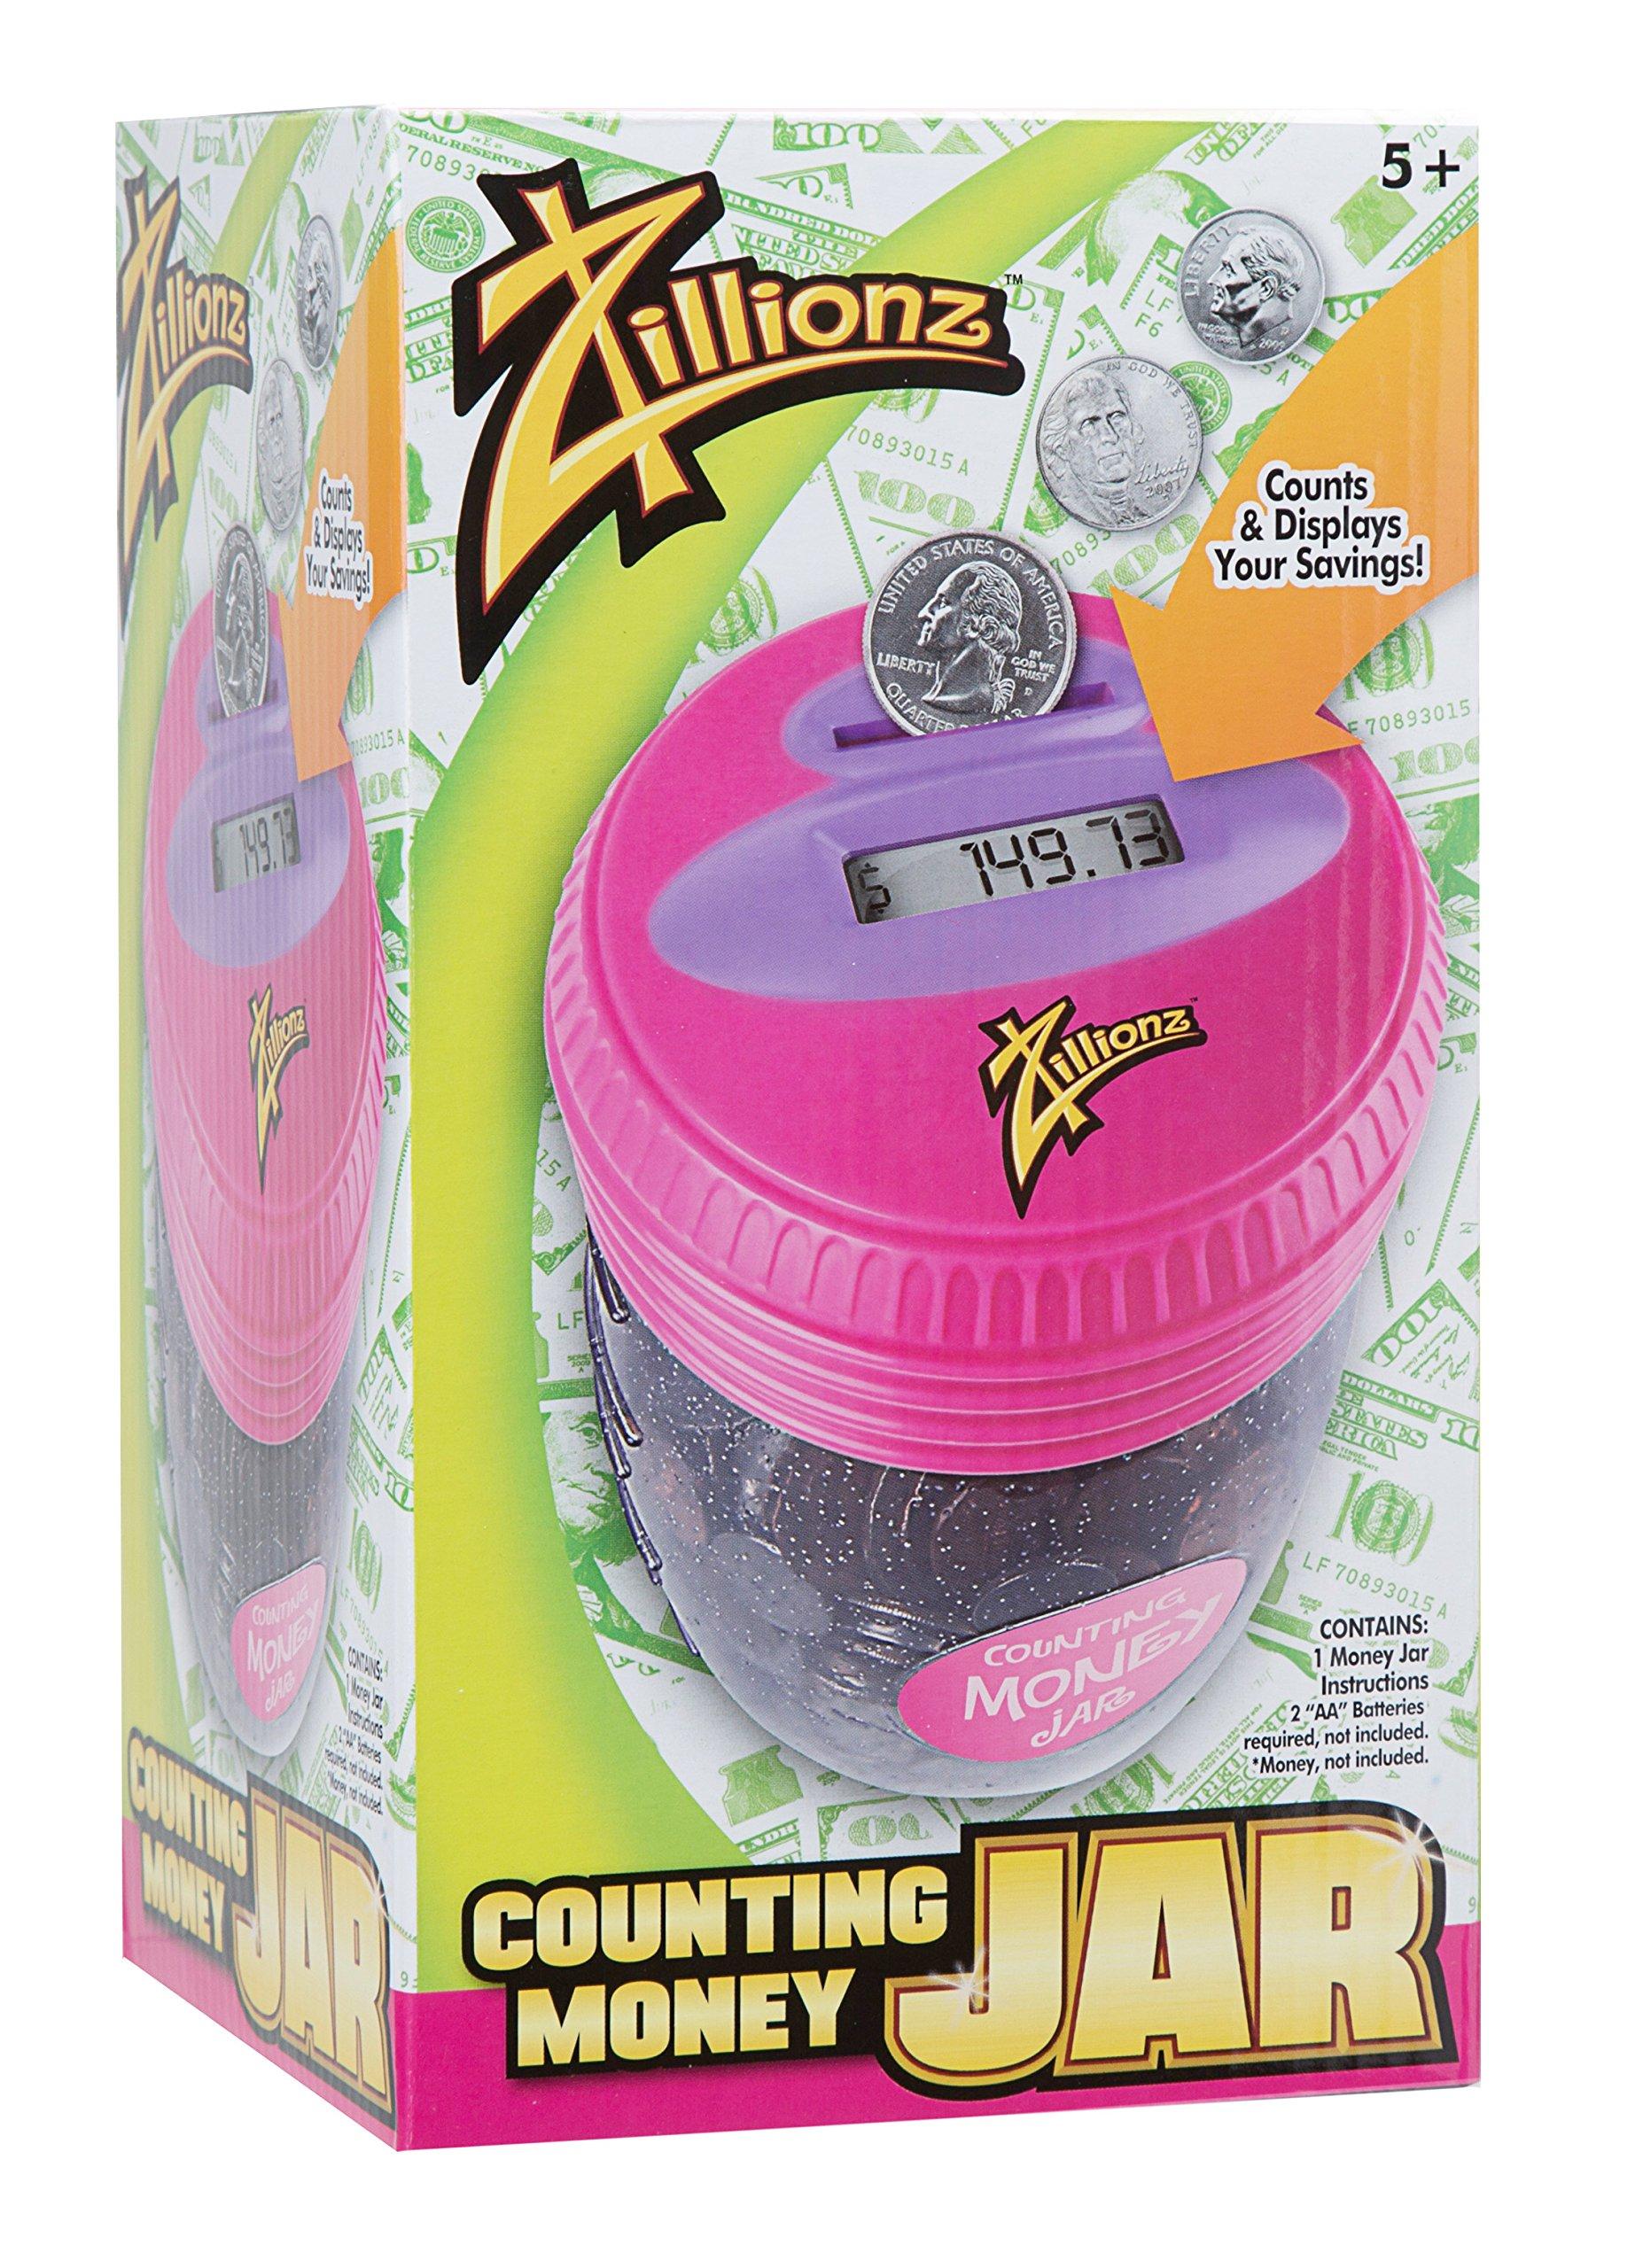 Zillionz Girl Counting Money Jar - Pink